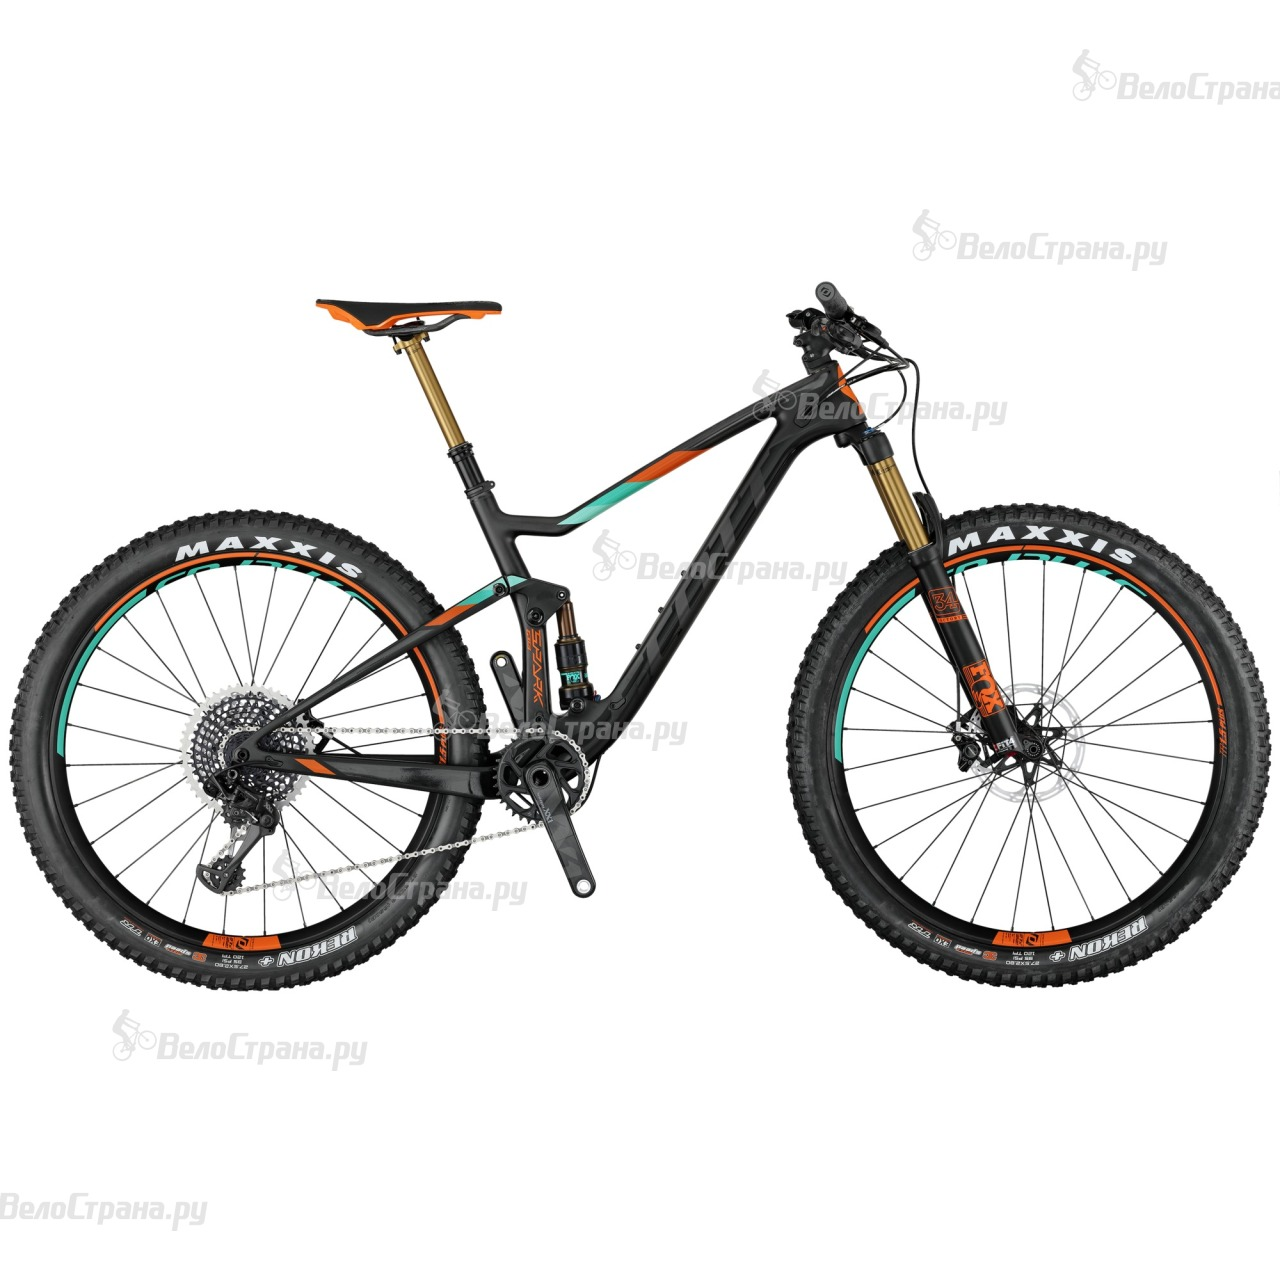 Велосипед Scott Spark 700 Plus Tuned (2017) велосипед scott spark 700 premium 2015